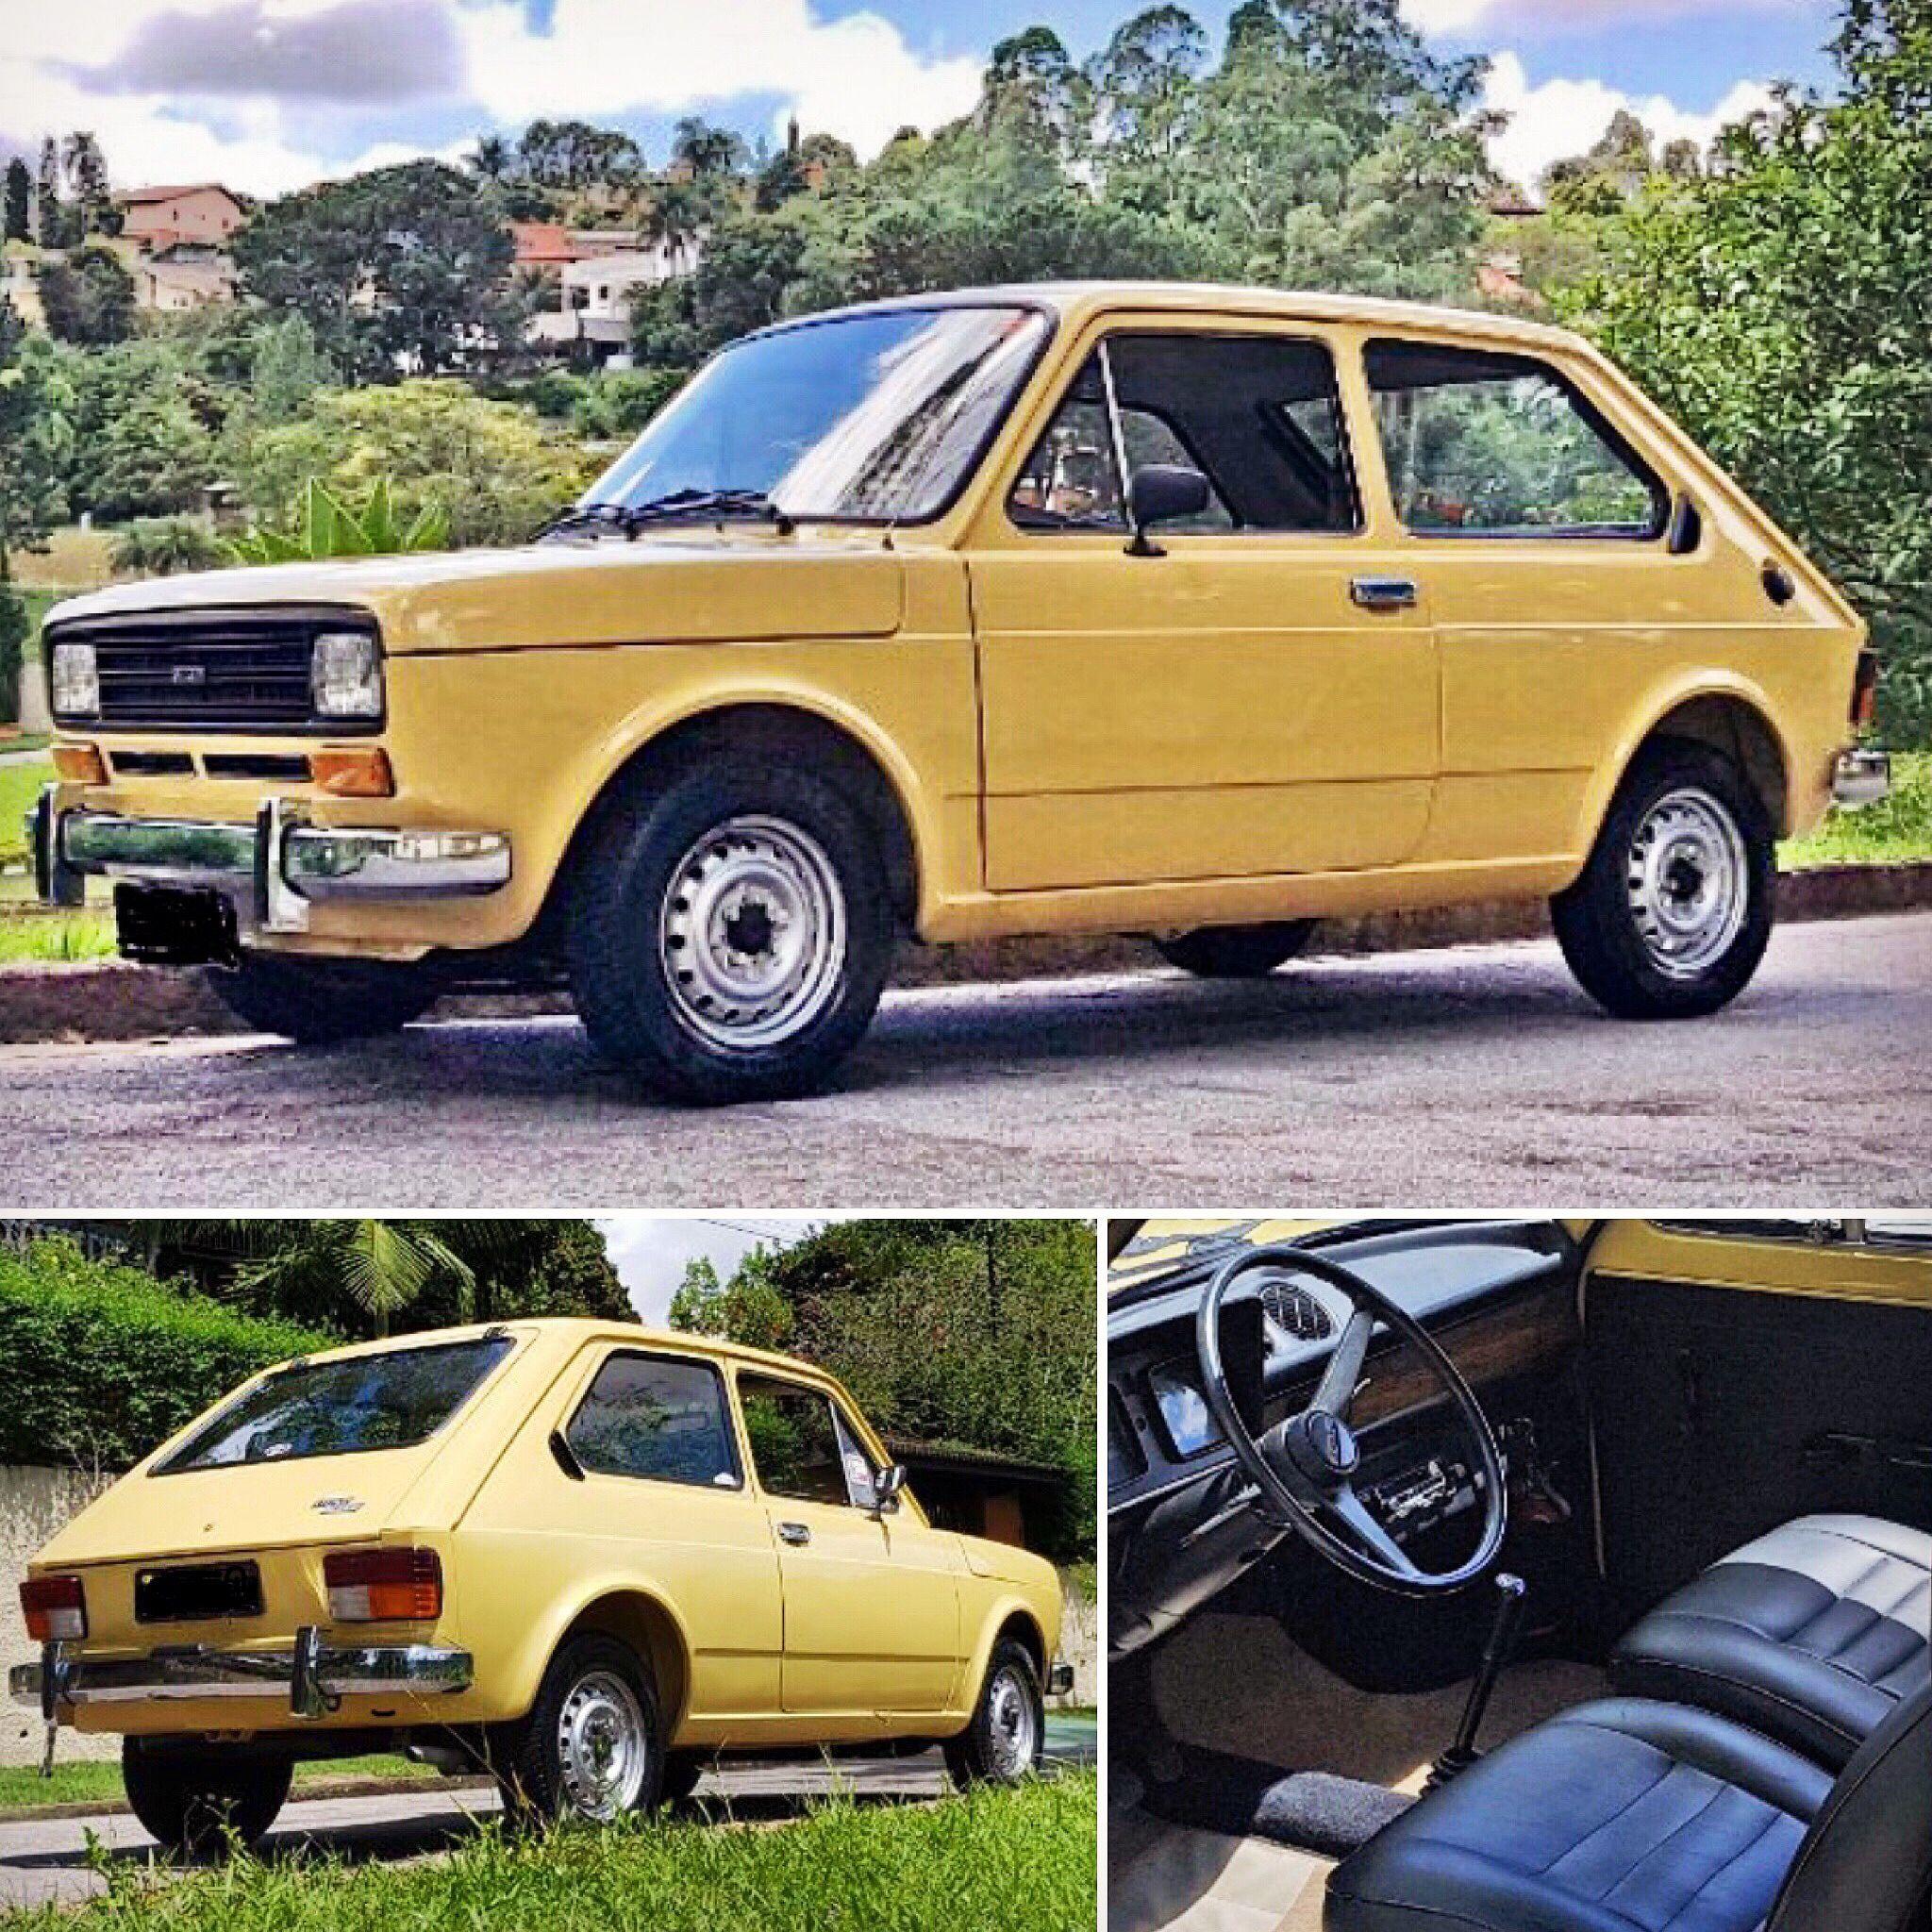 Fiat 147l 1977 78 Carro Gurgel Carros Nacionais Carro